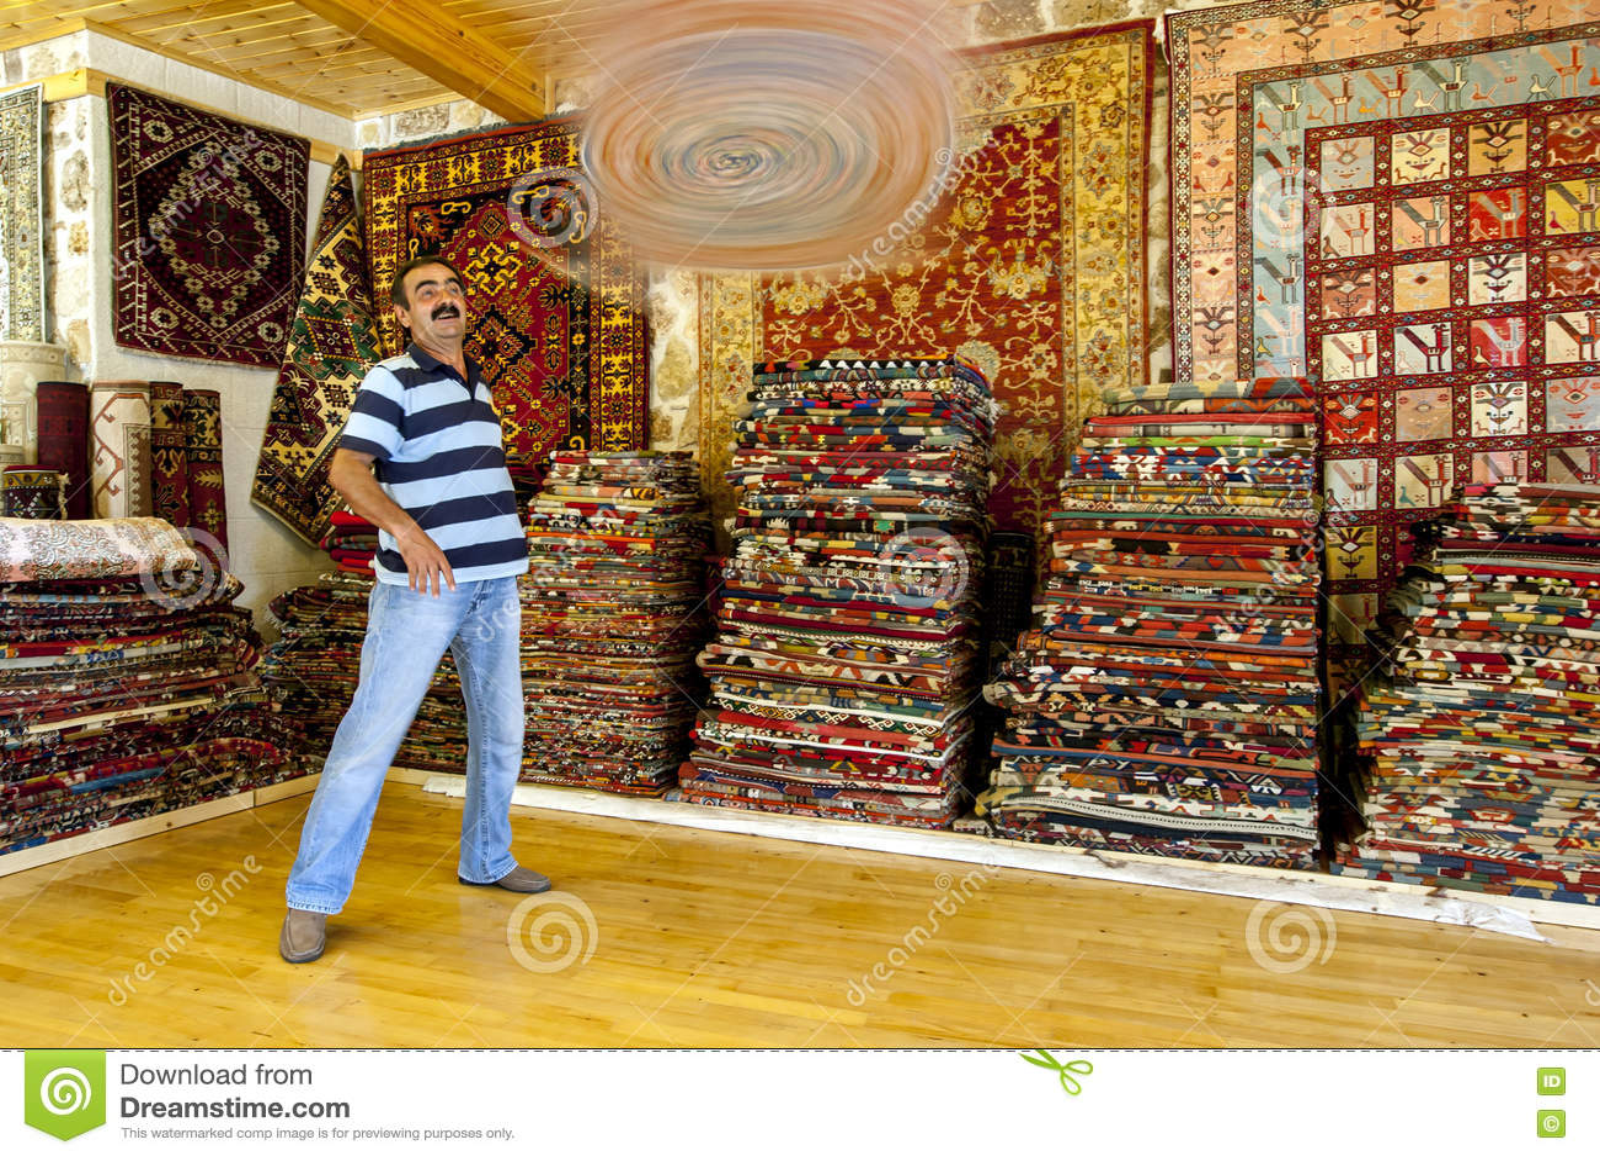 A Turkish Carpet Seller In Antalya Turkey